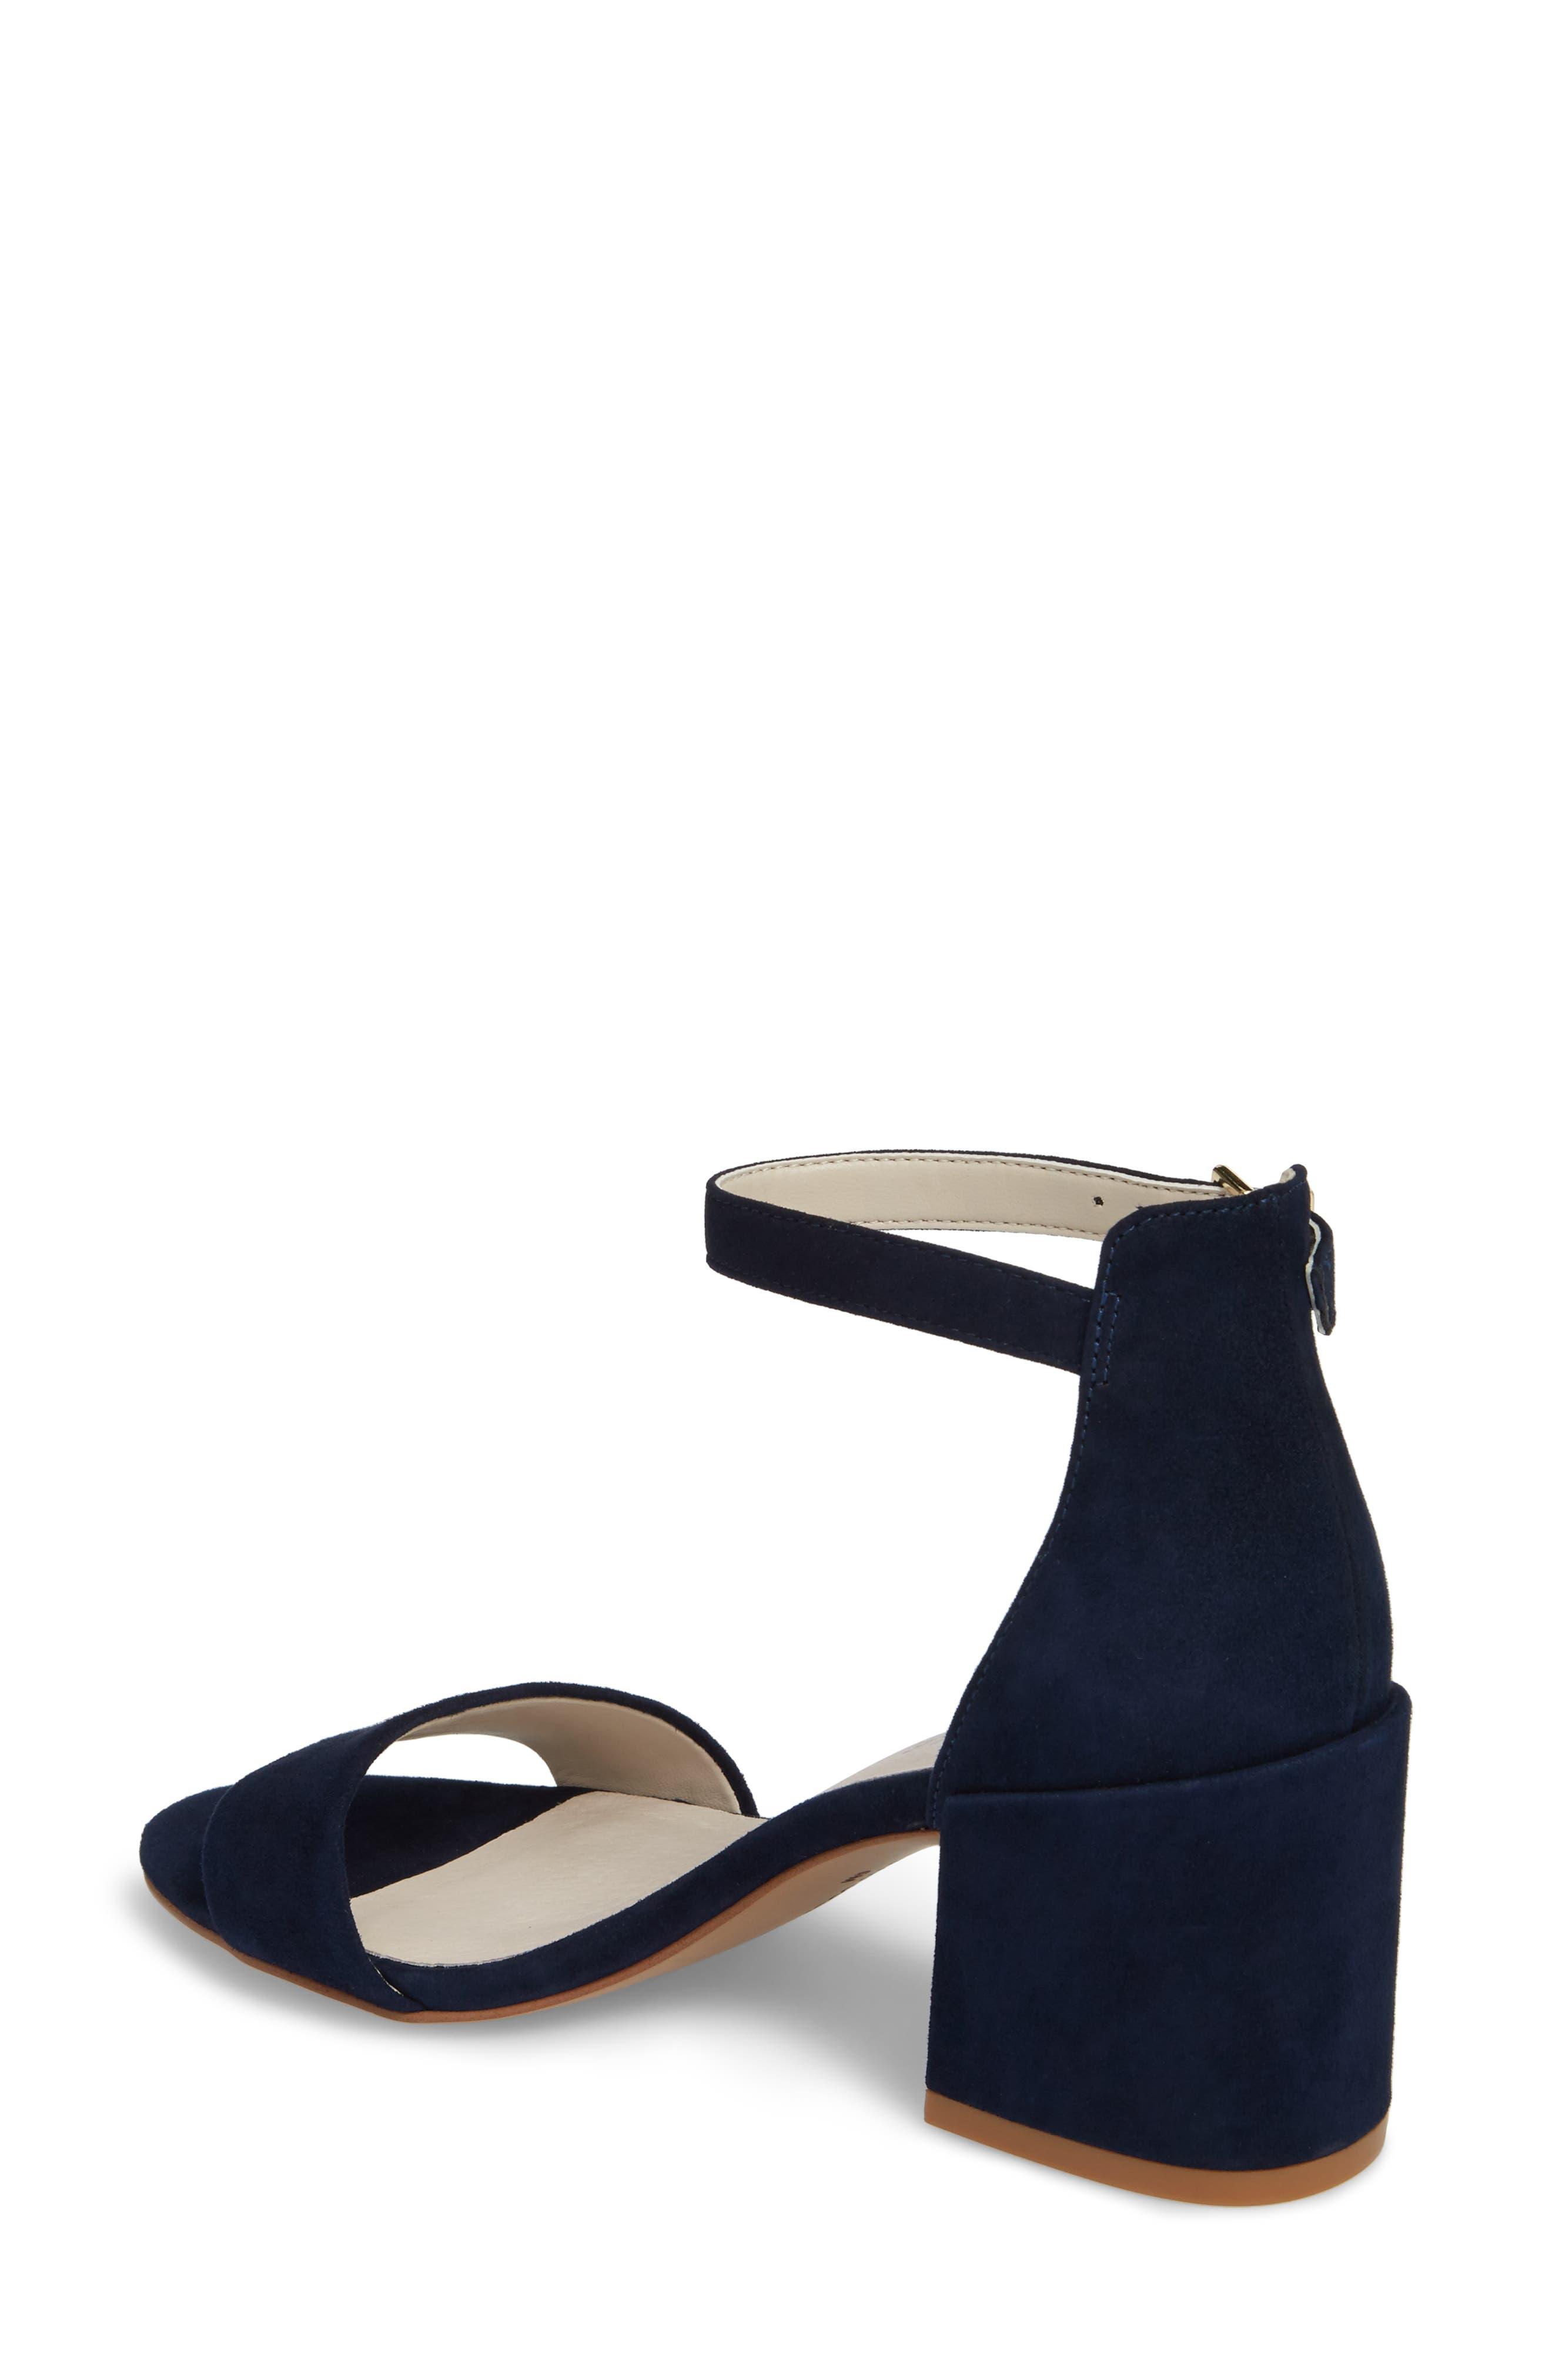 Hannon Block Heel Ankle Strap Sandal,                             Alternate thumbnail 2, color,                             Navy Suede